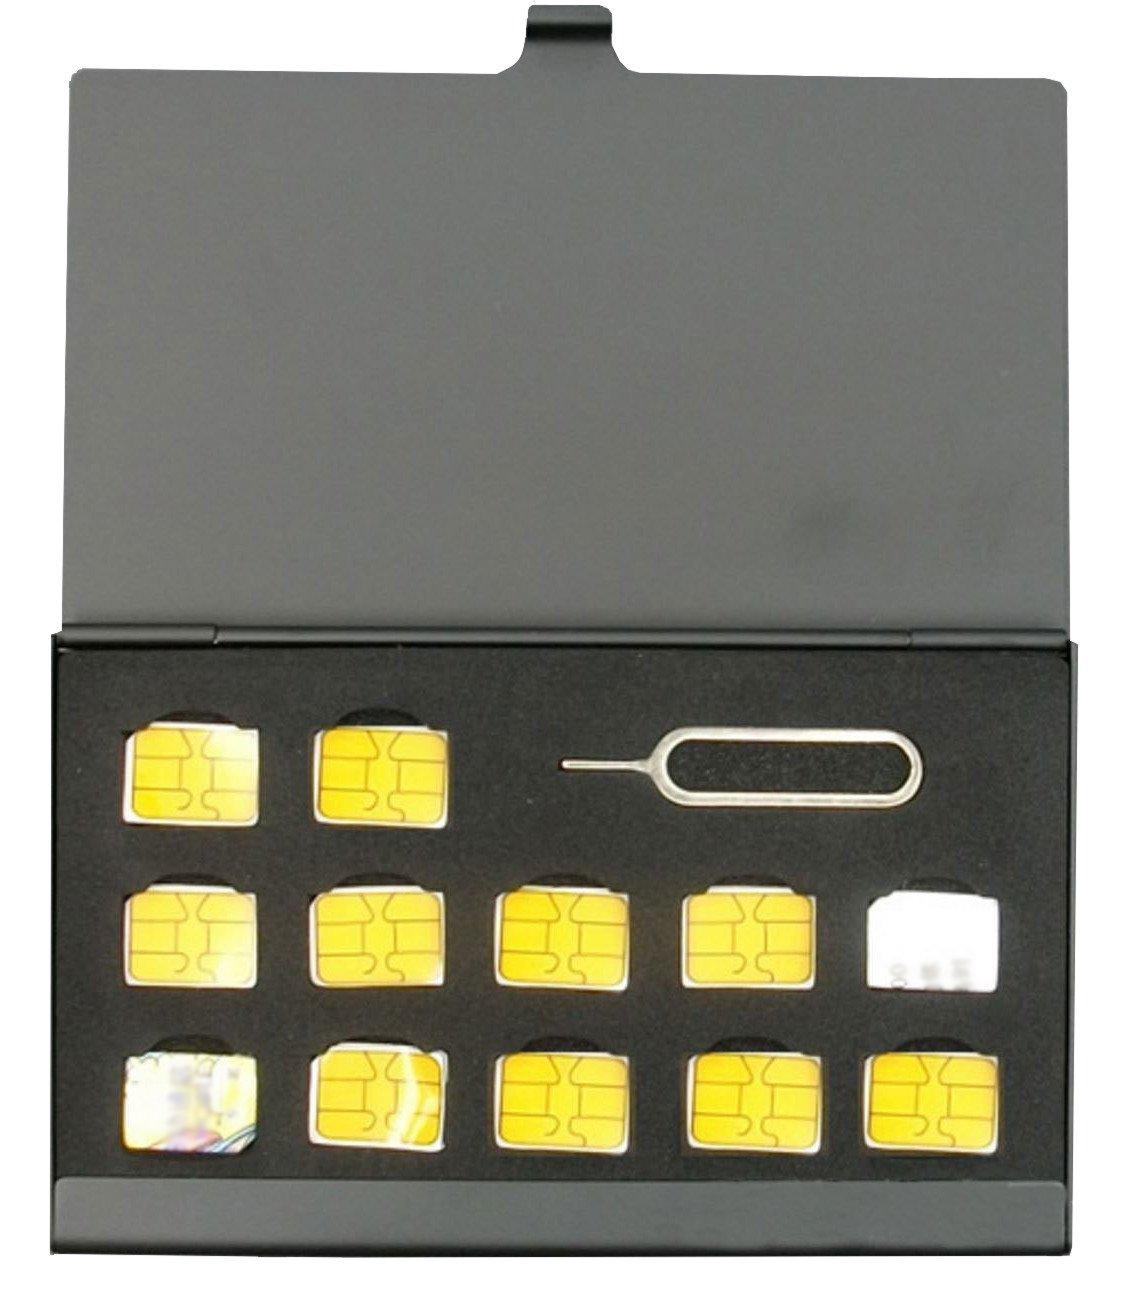 BlueCraft Slim Nano SIM (Max. 12 nano SIM cards) Card Aluminum Holder Case Storage with SIM Card adapters (Black) by BlueCraft